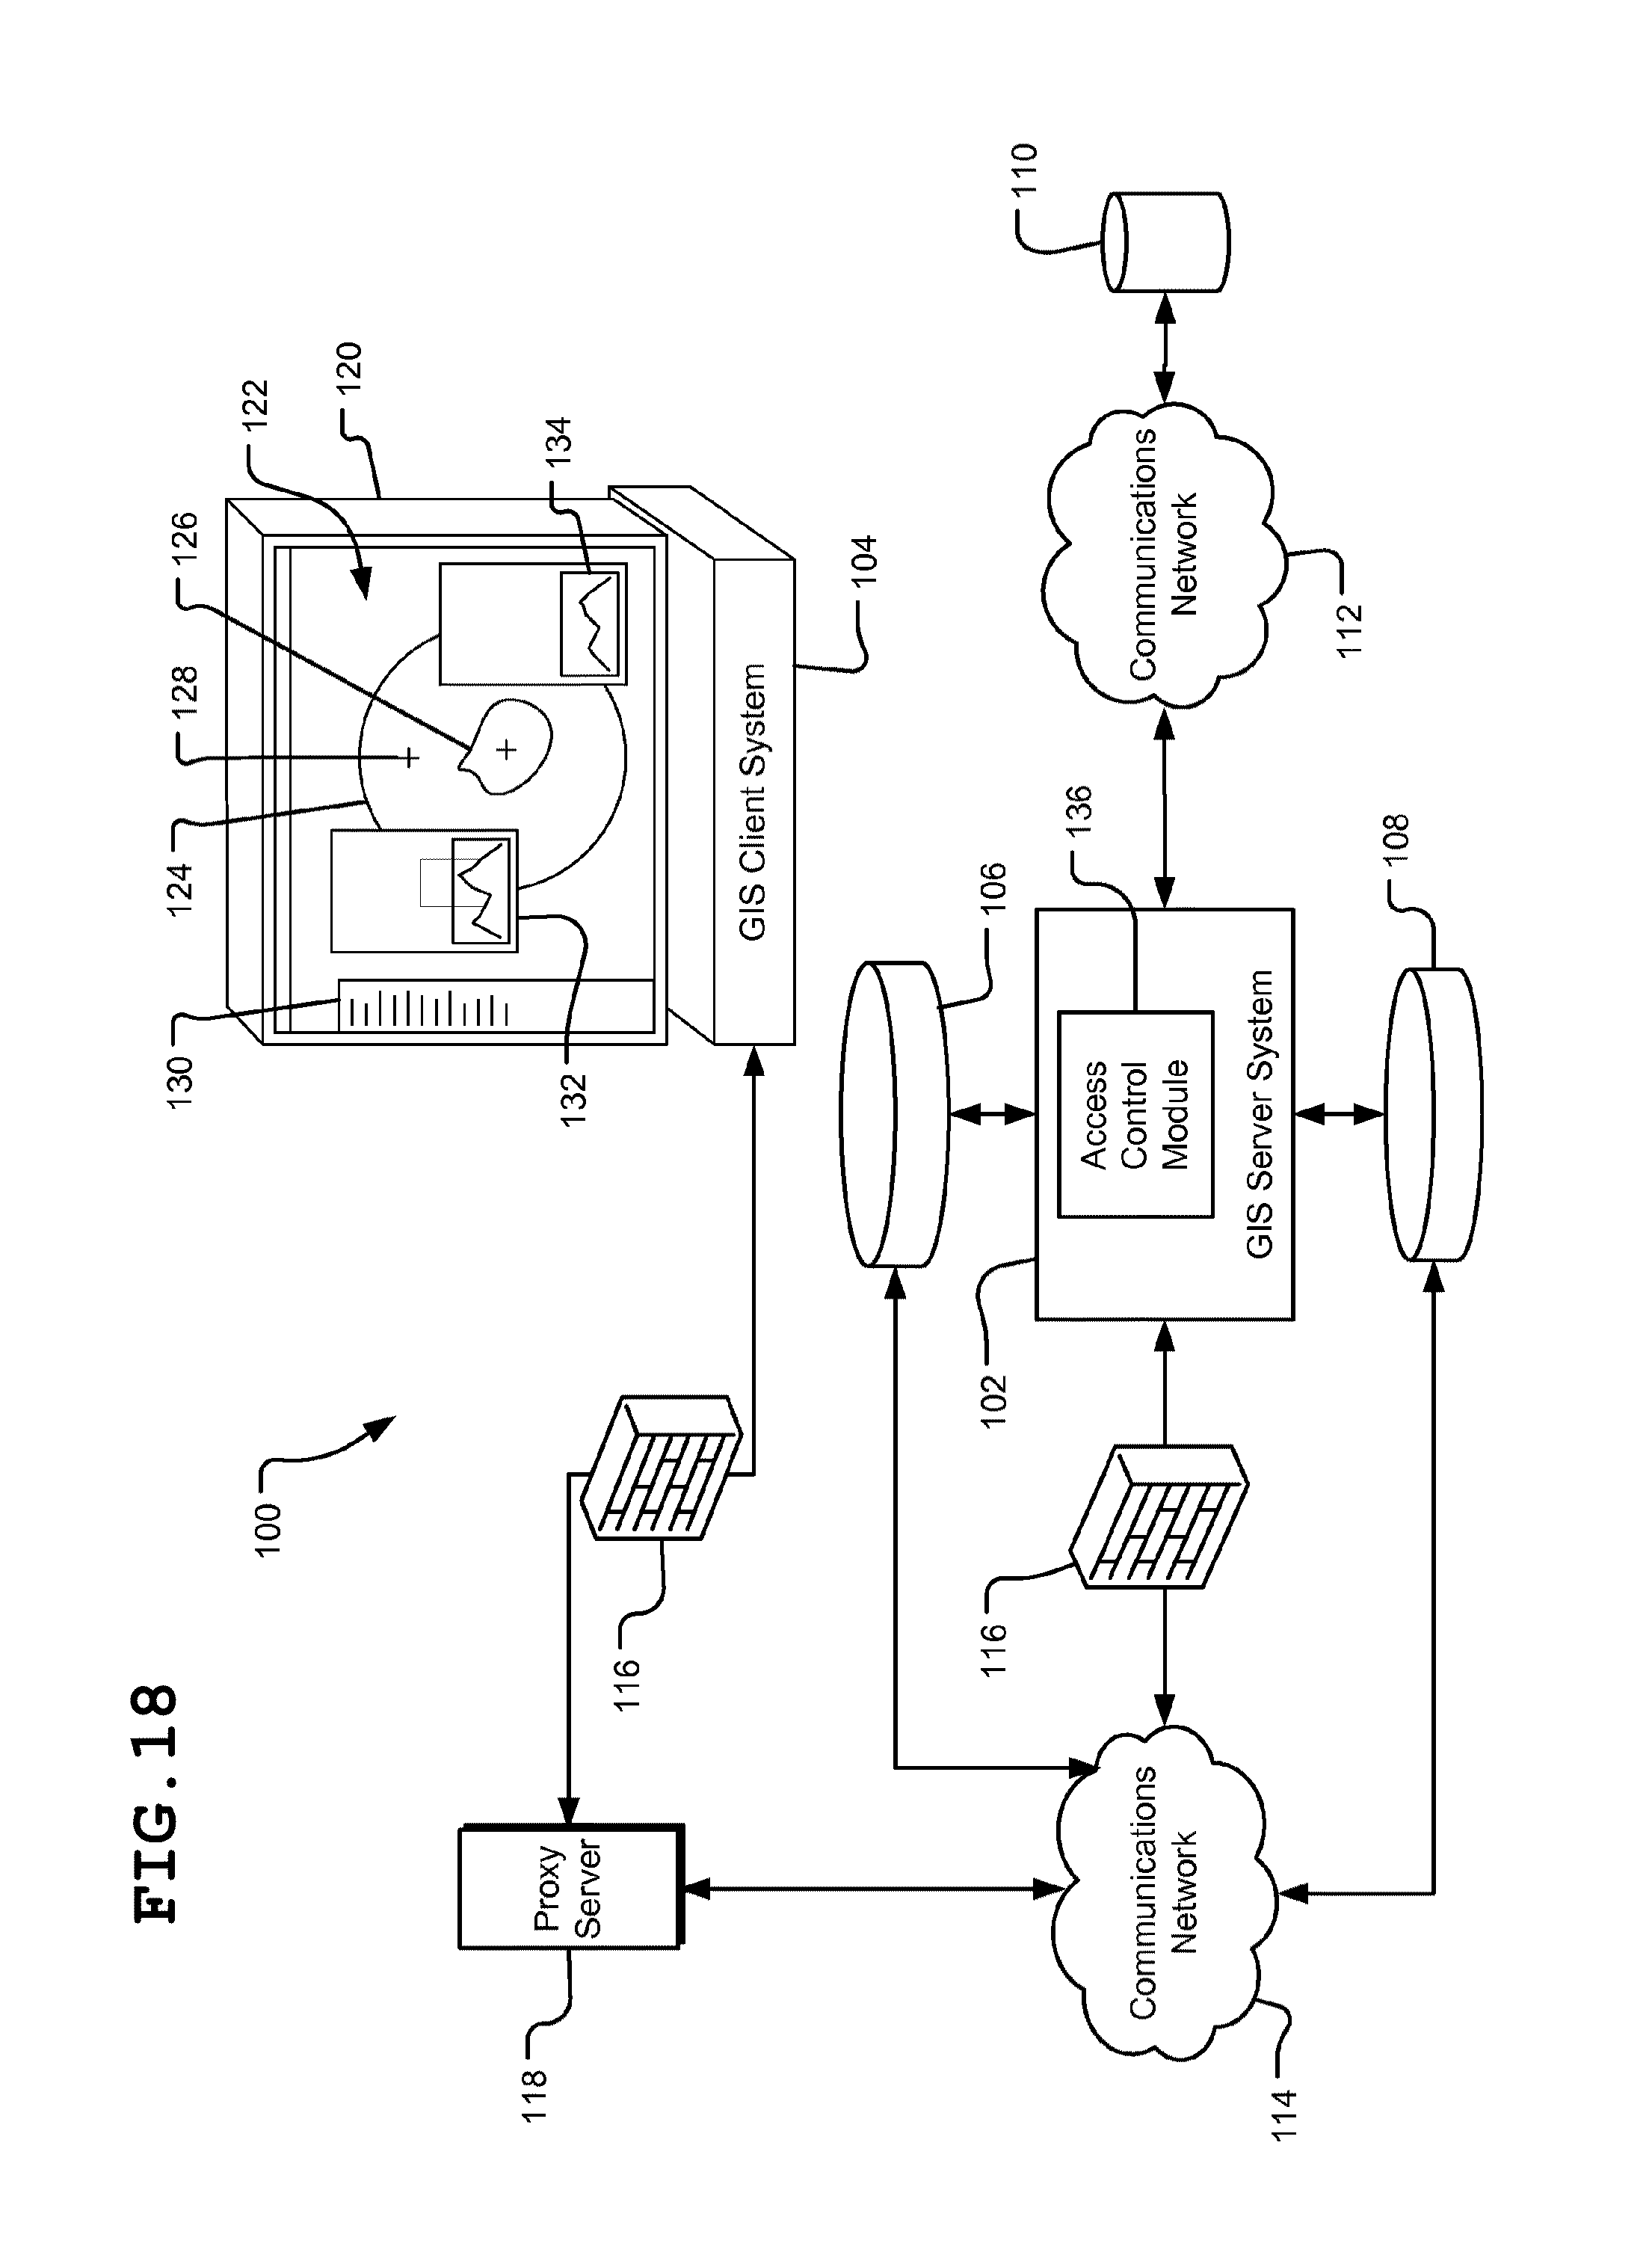 slick magneto wiring diagram slick magneto installation